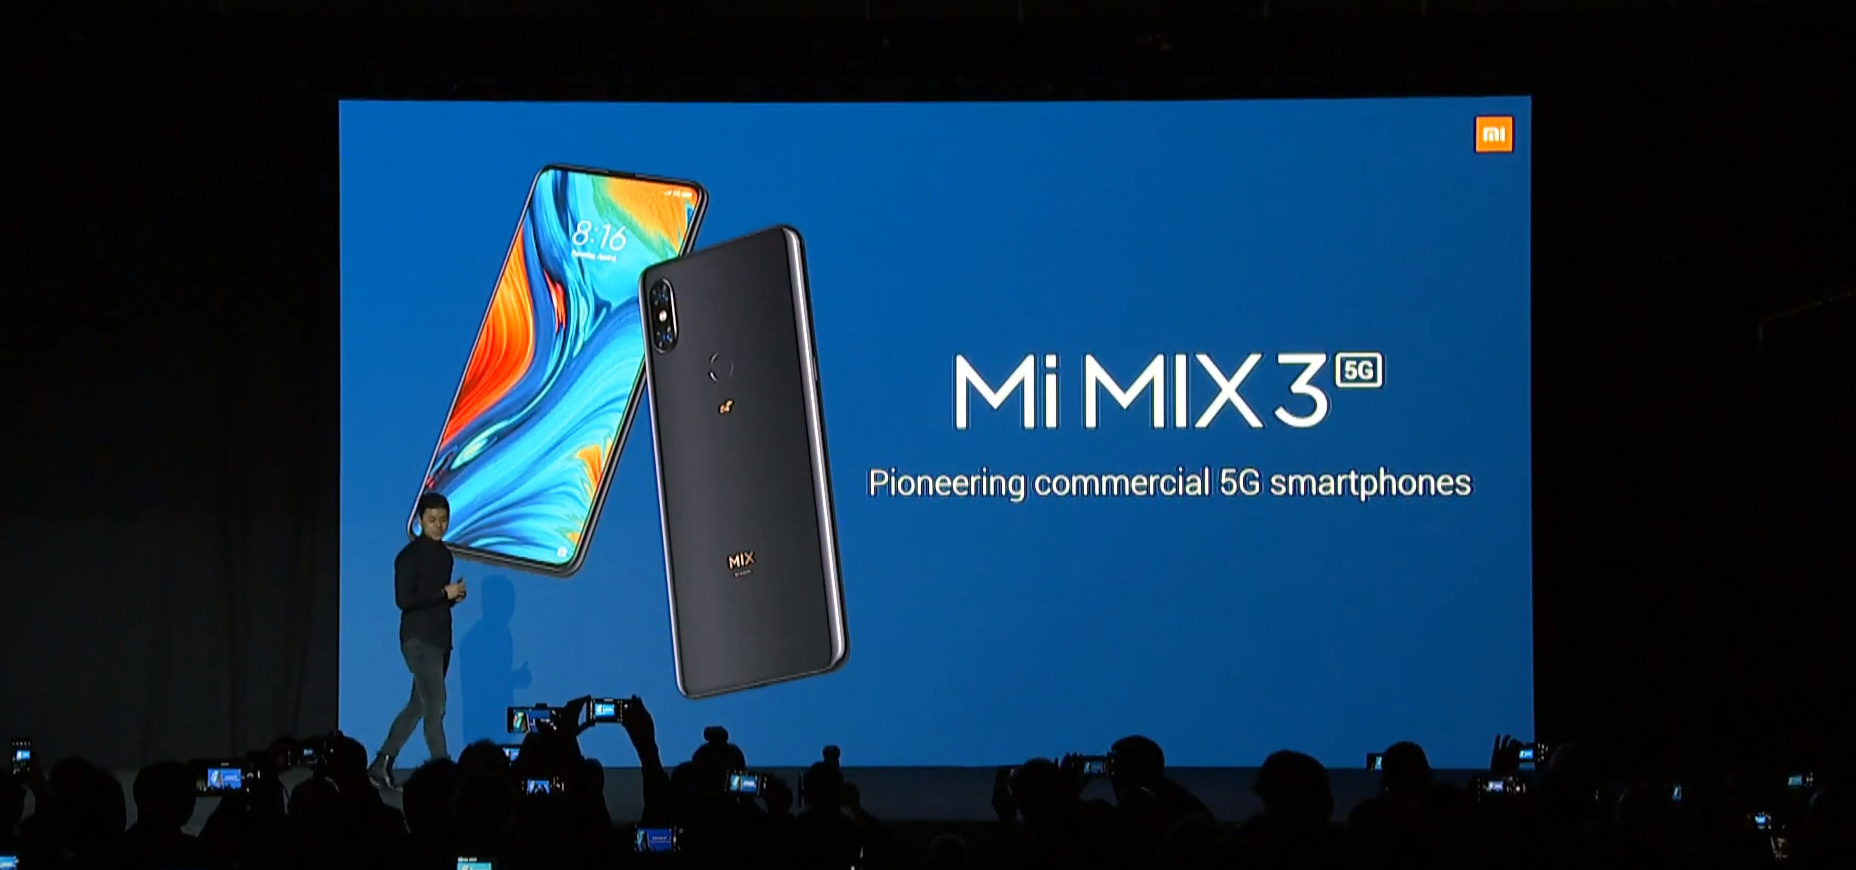 mi-mix3-5g-mwc